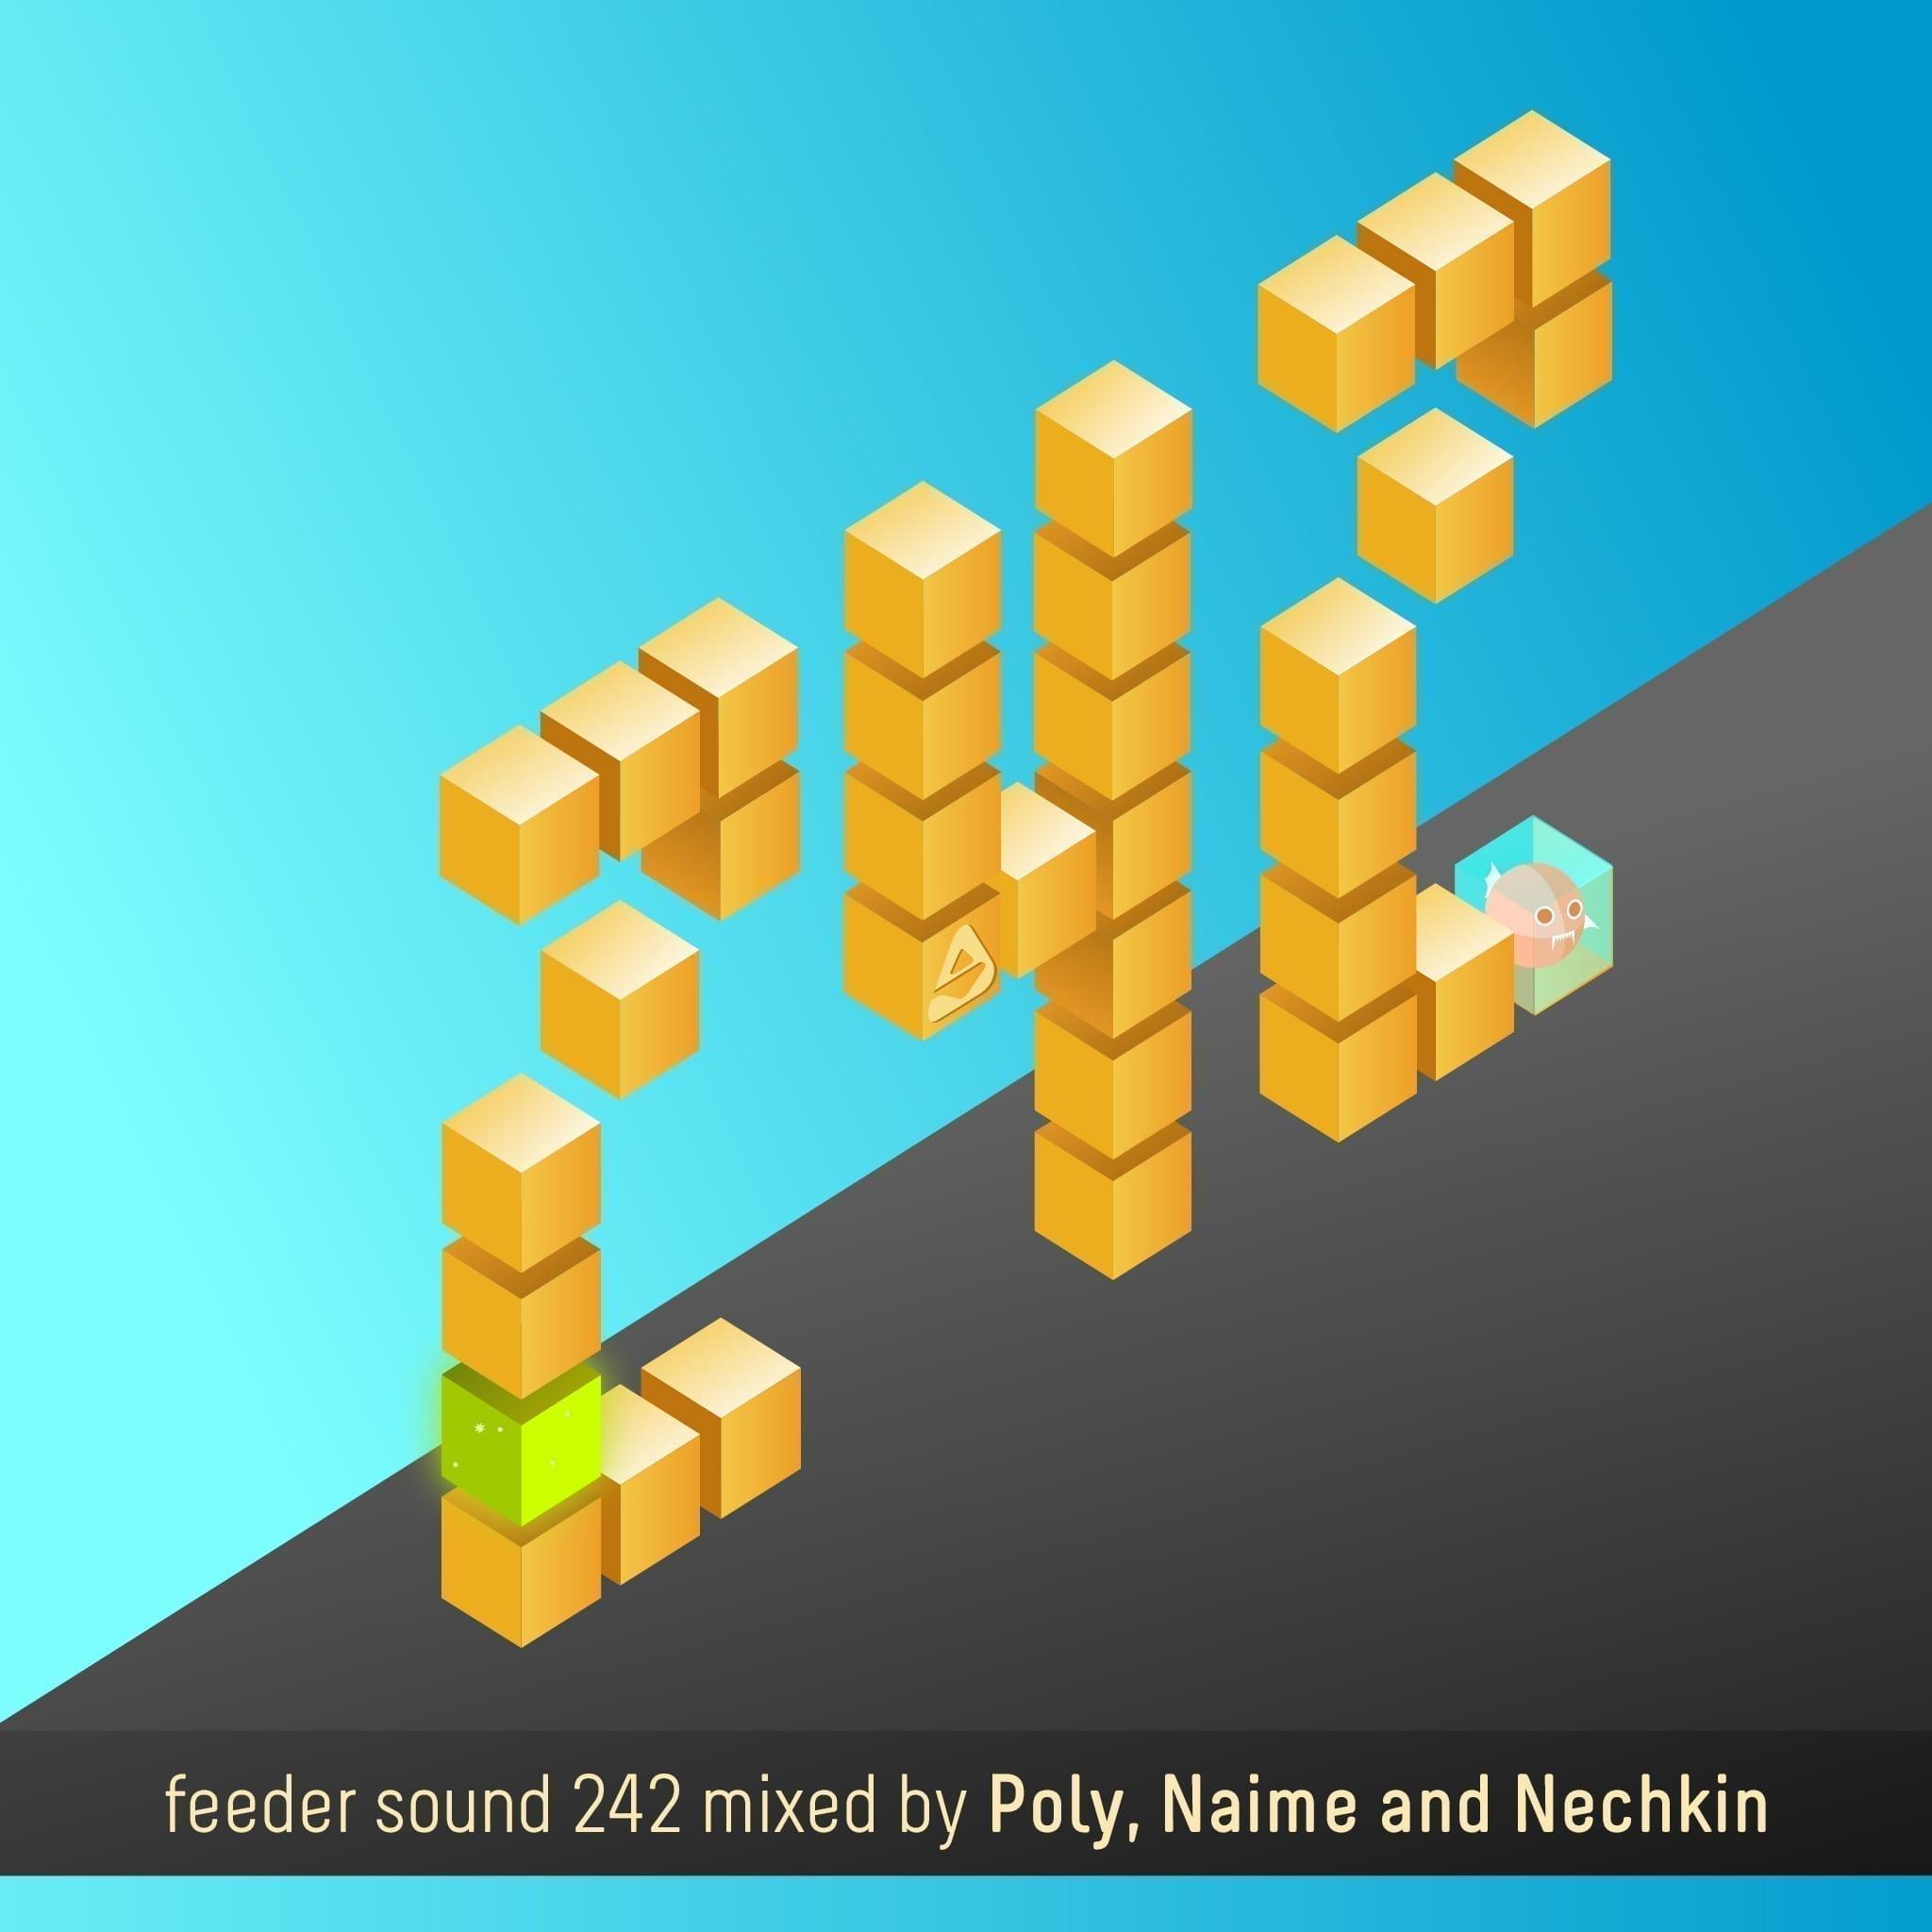 feeder sound 242 mixed by Poly Naime Nichkin 01